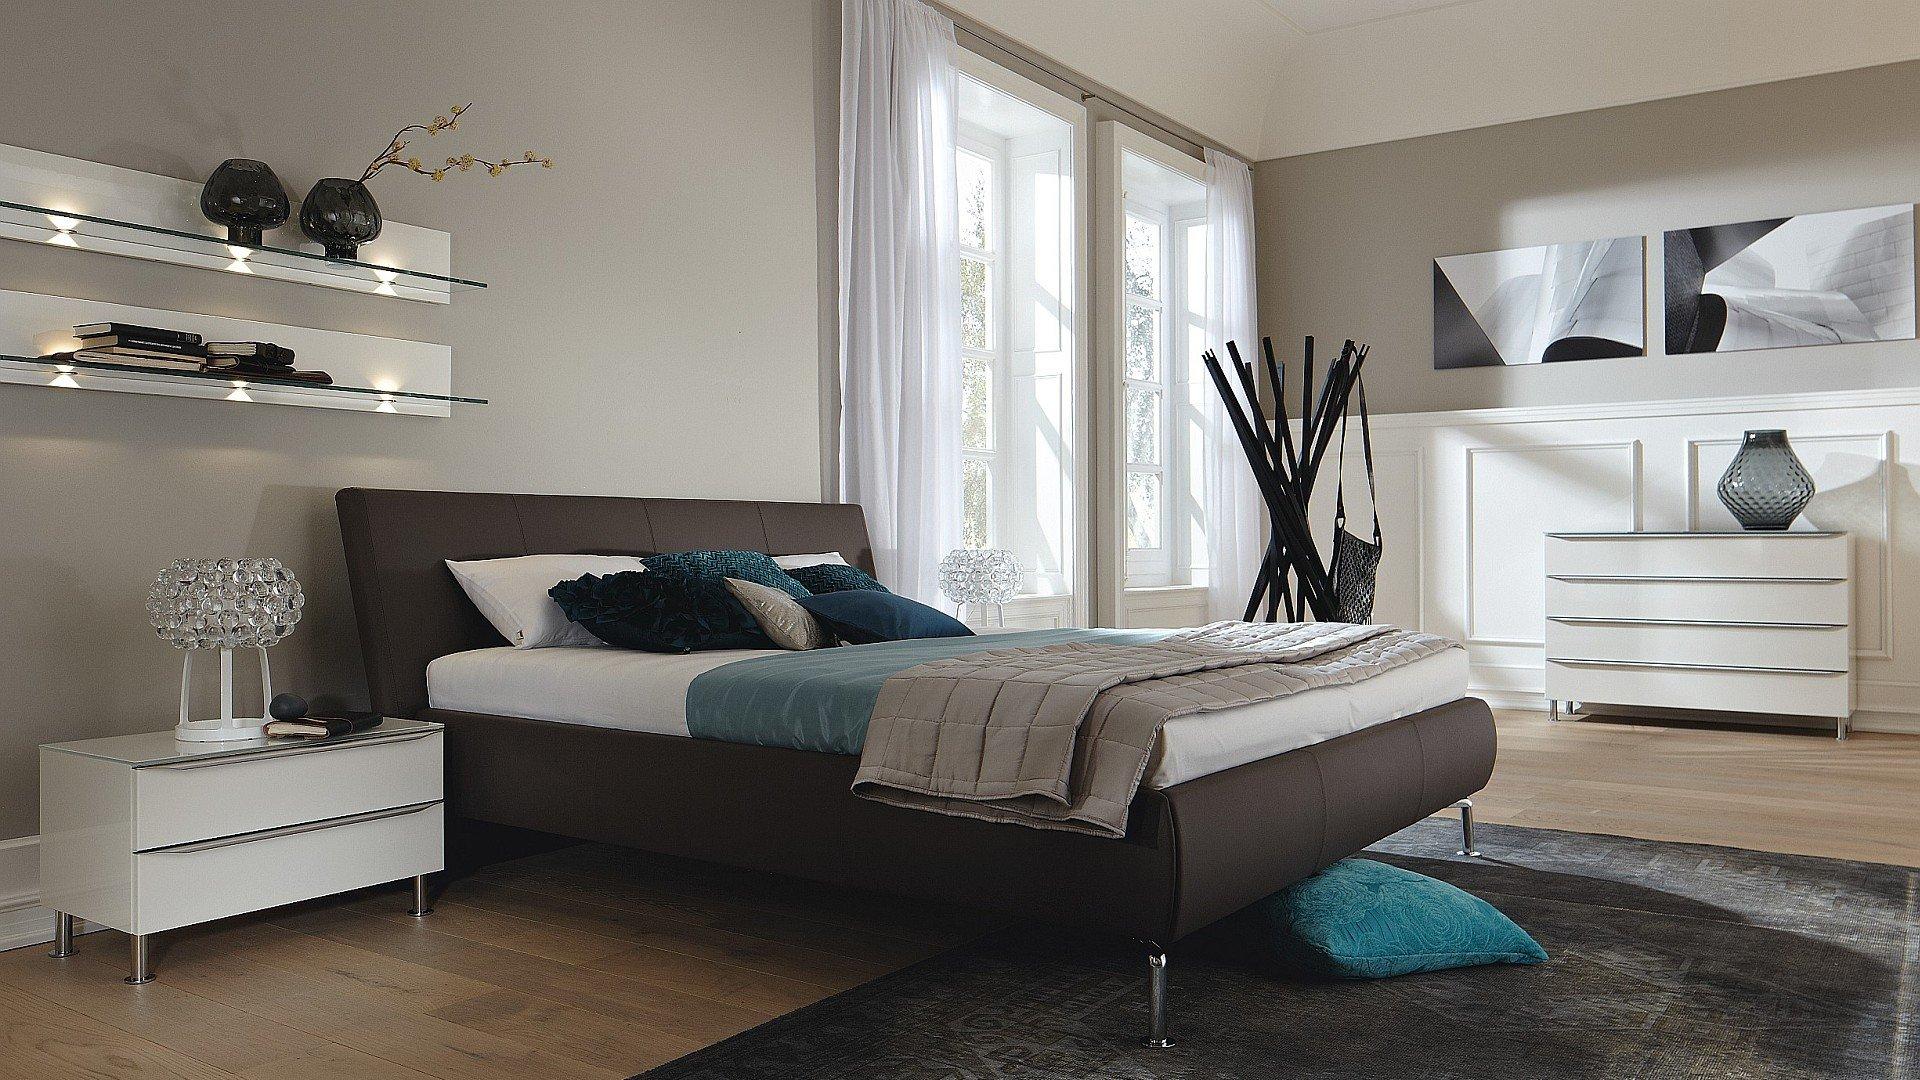 metis plus home style. Black Bedroom Furniture Sets. Home Design Ideas